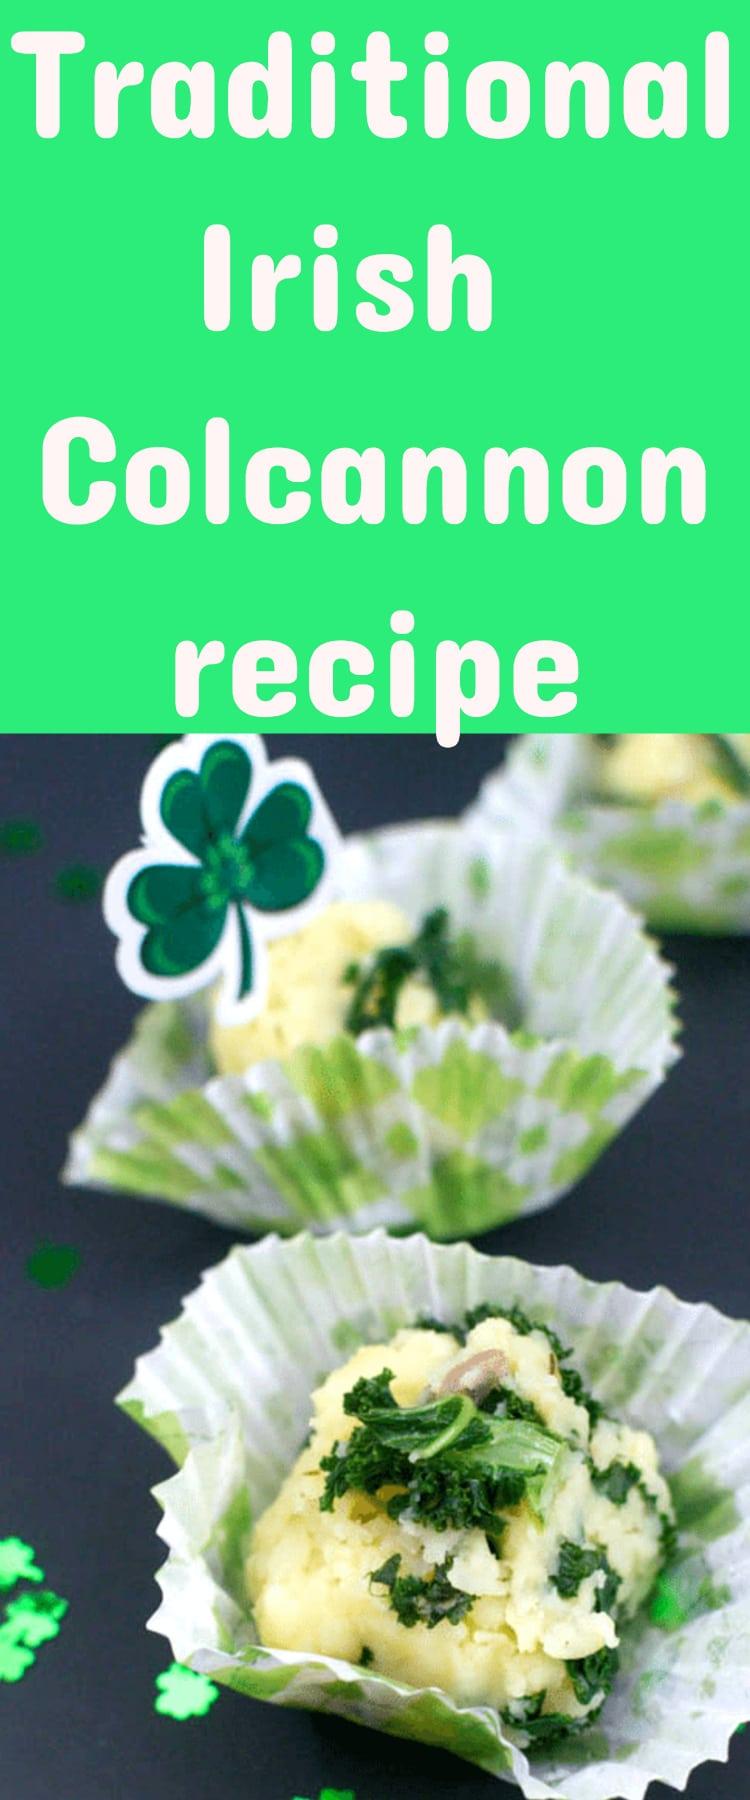 Irish recipes / recipes for st. patrick's day / colcannon / irish colcannon / potatoes / kale and potatoes #stpatricksday #irish